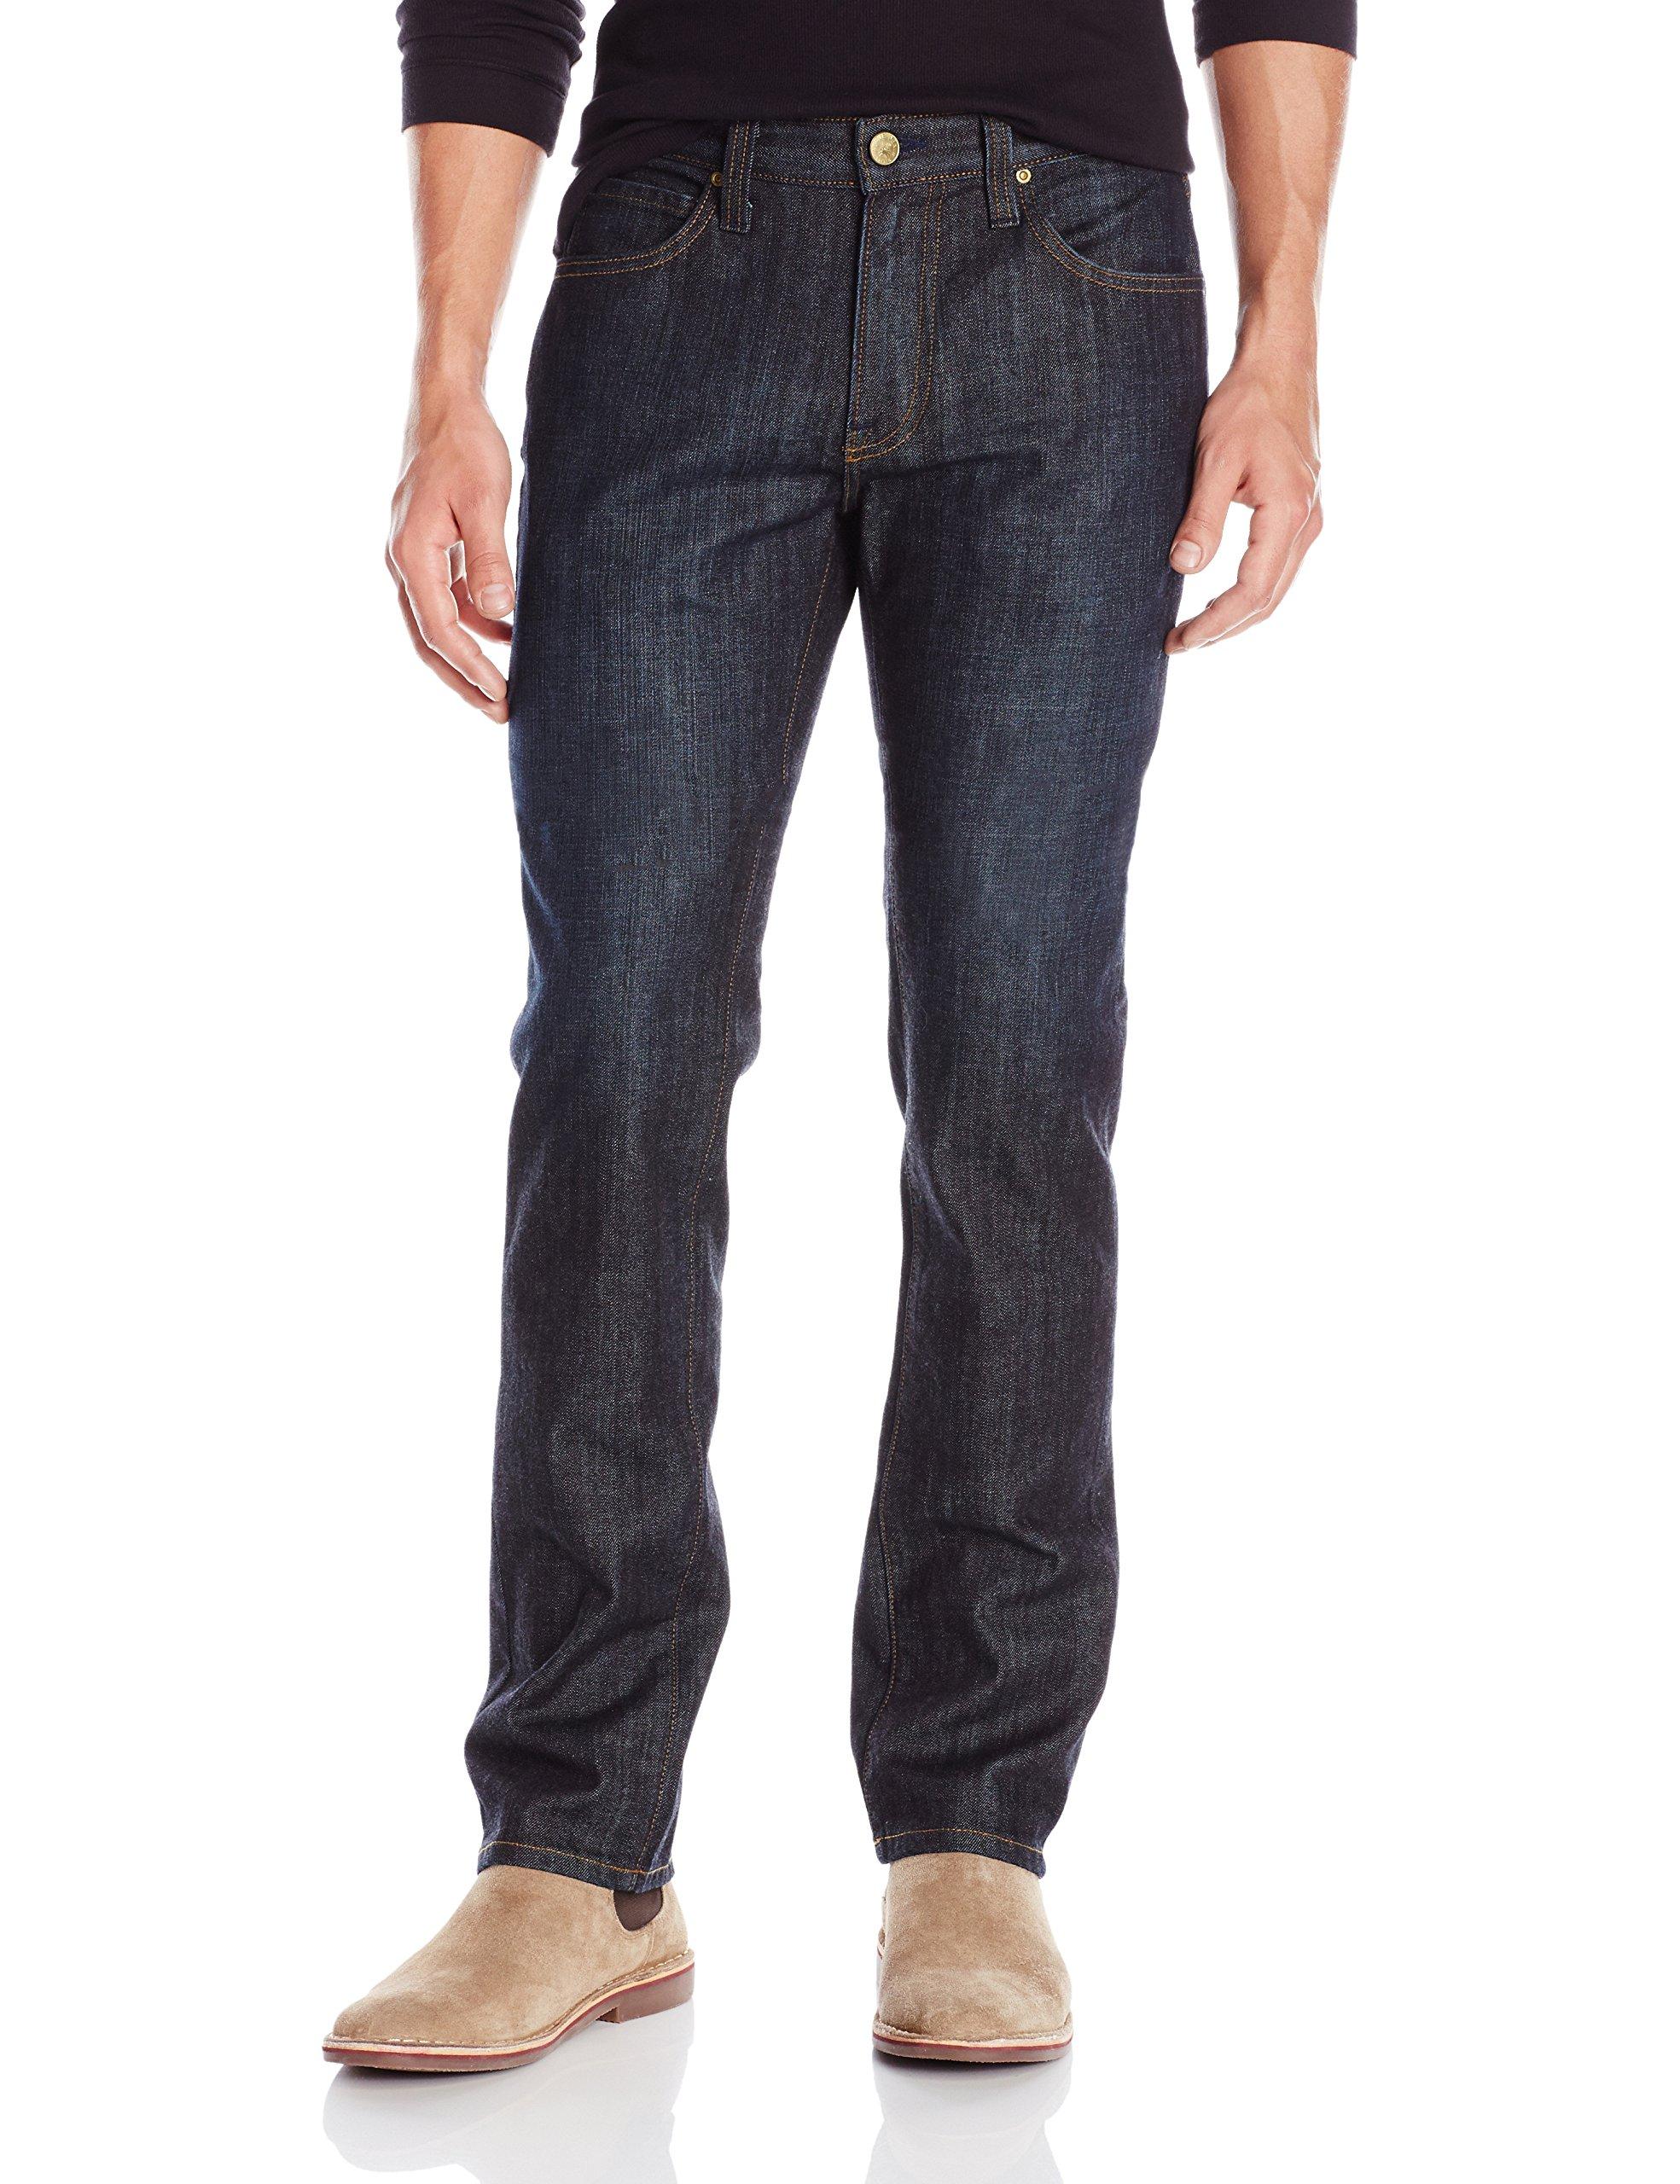 Agave Men's Rocker Slim Fit 5 Pocket Jeans In Leaucadia, Leucadia, 40 by Agave (Image #1)